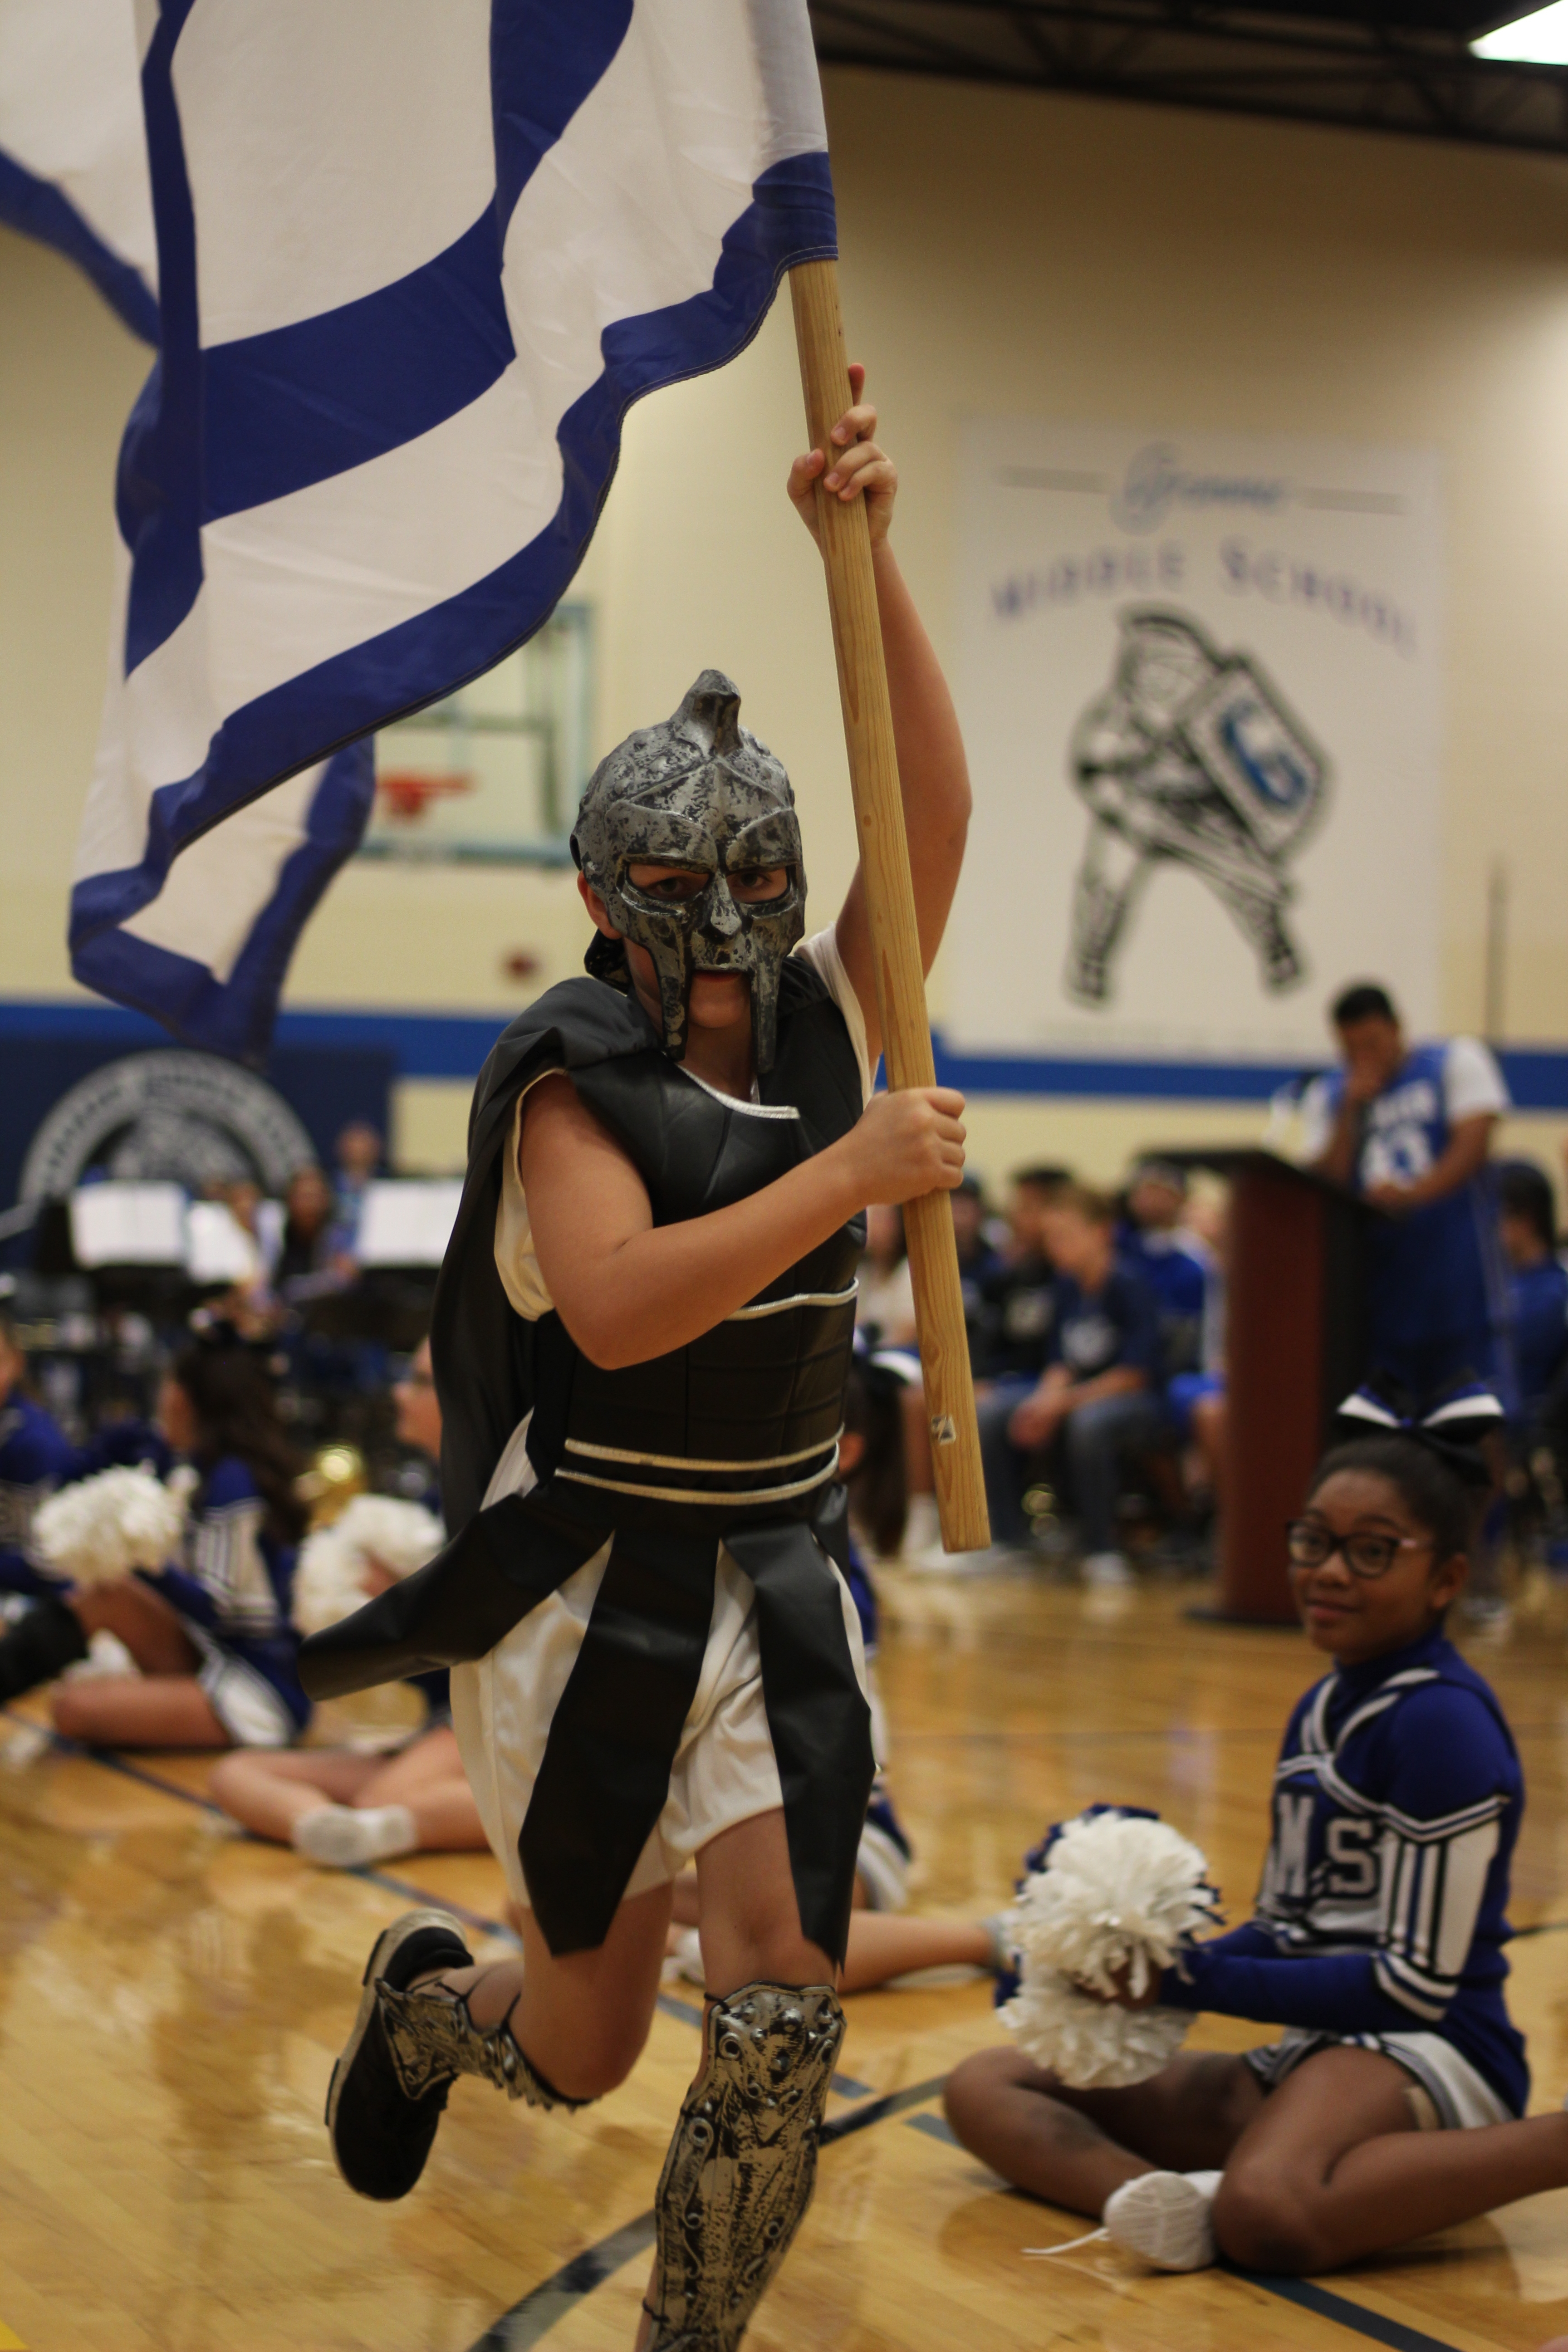 Gladiator runs across the gym